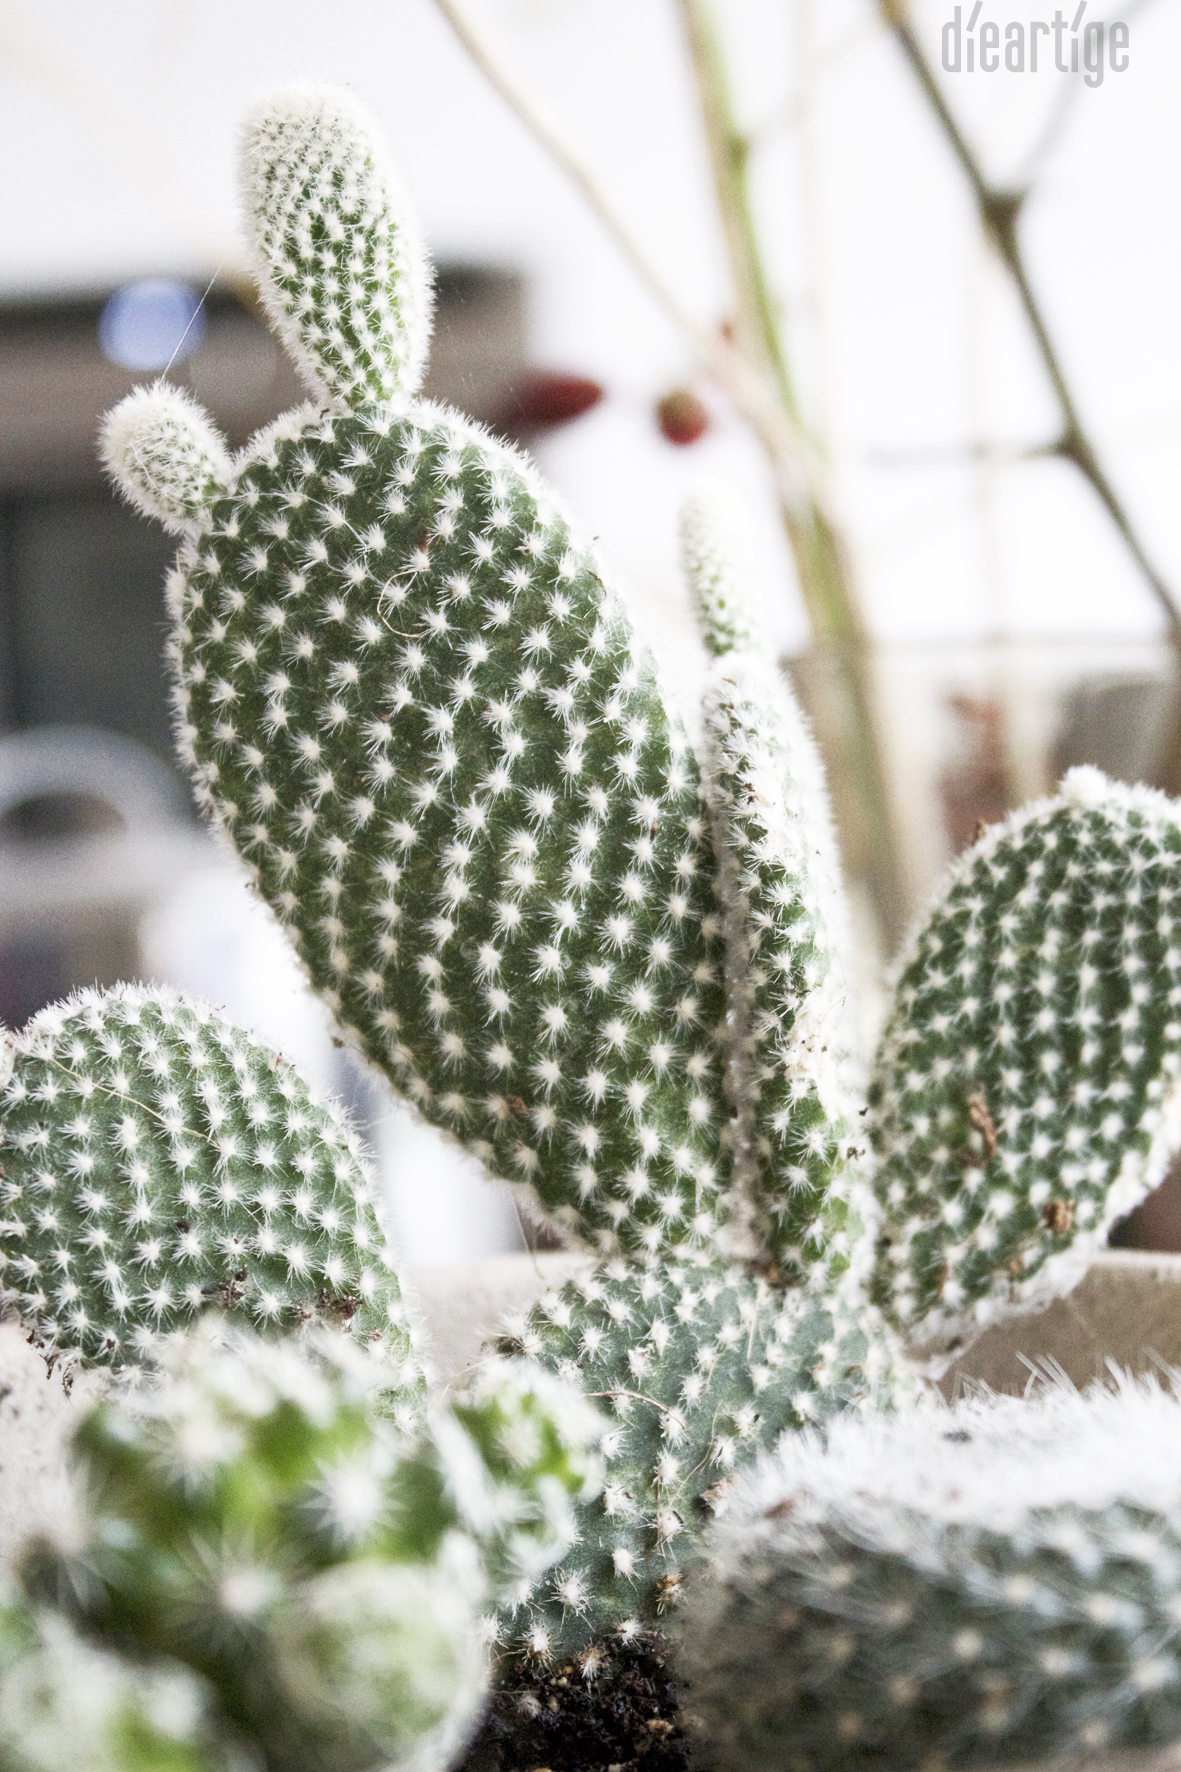 dieartigeBLOG - Ohren-Kaktus